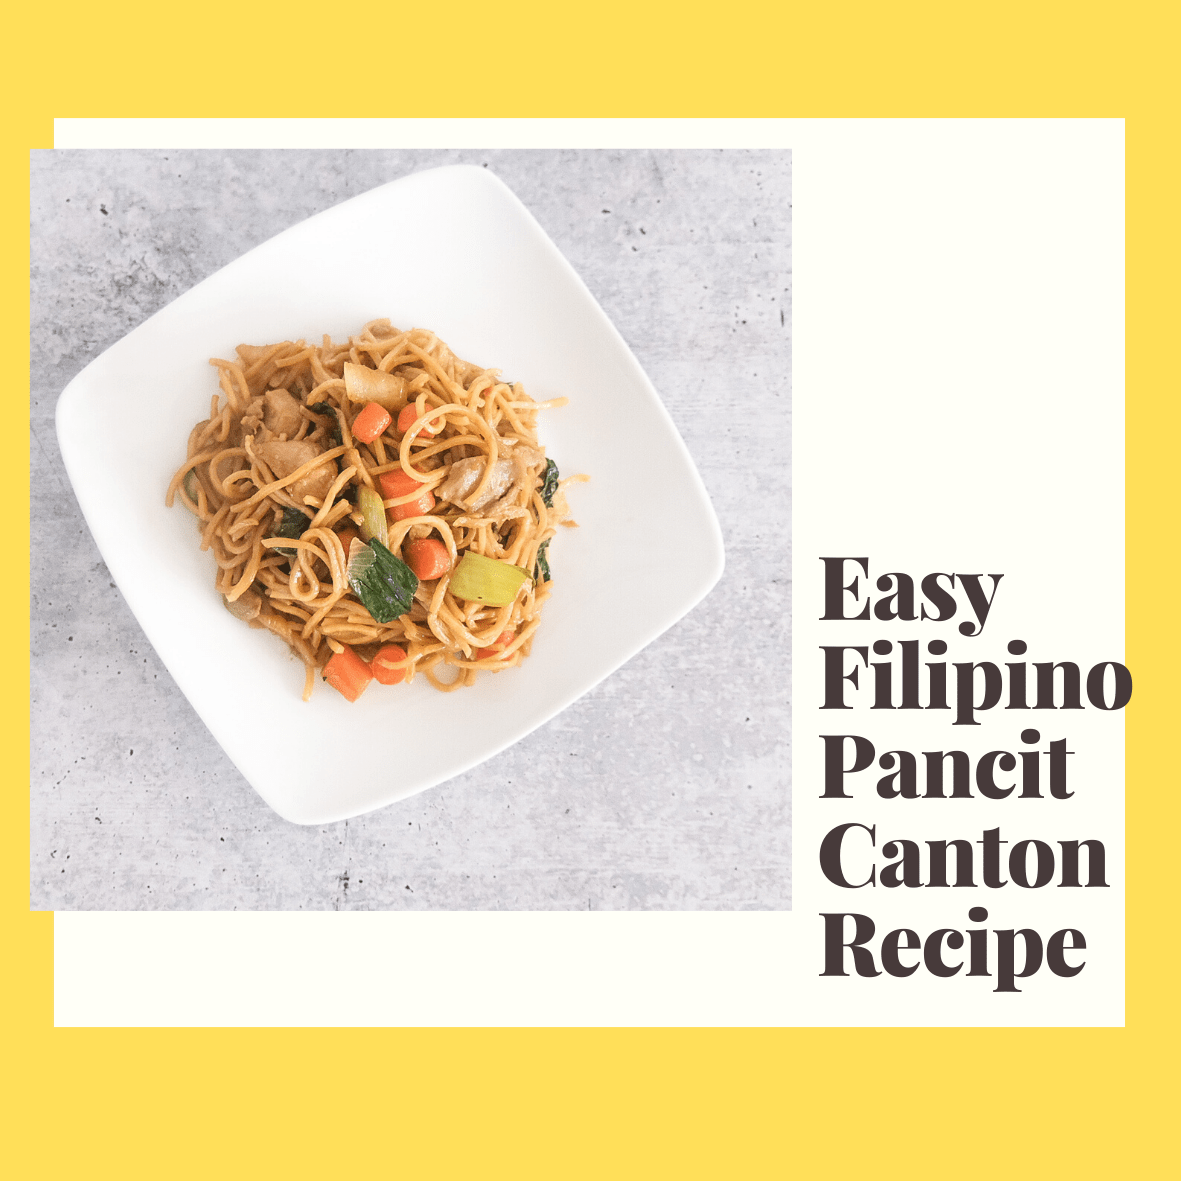 Easy Filipino Noodle Recipe: Pancit Canton